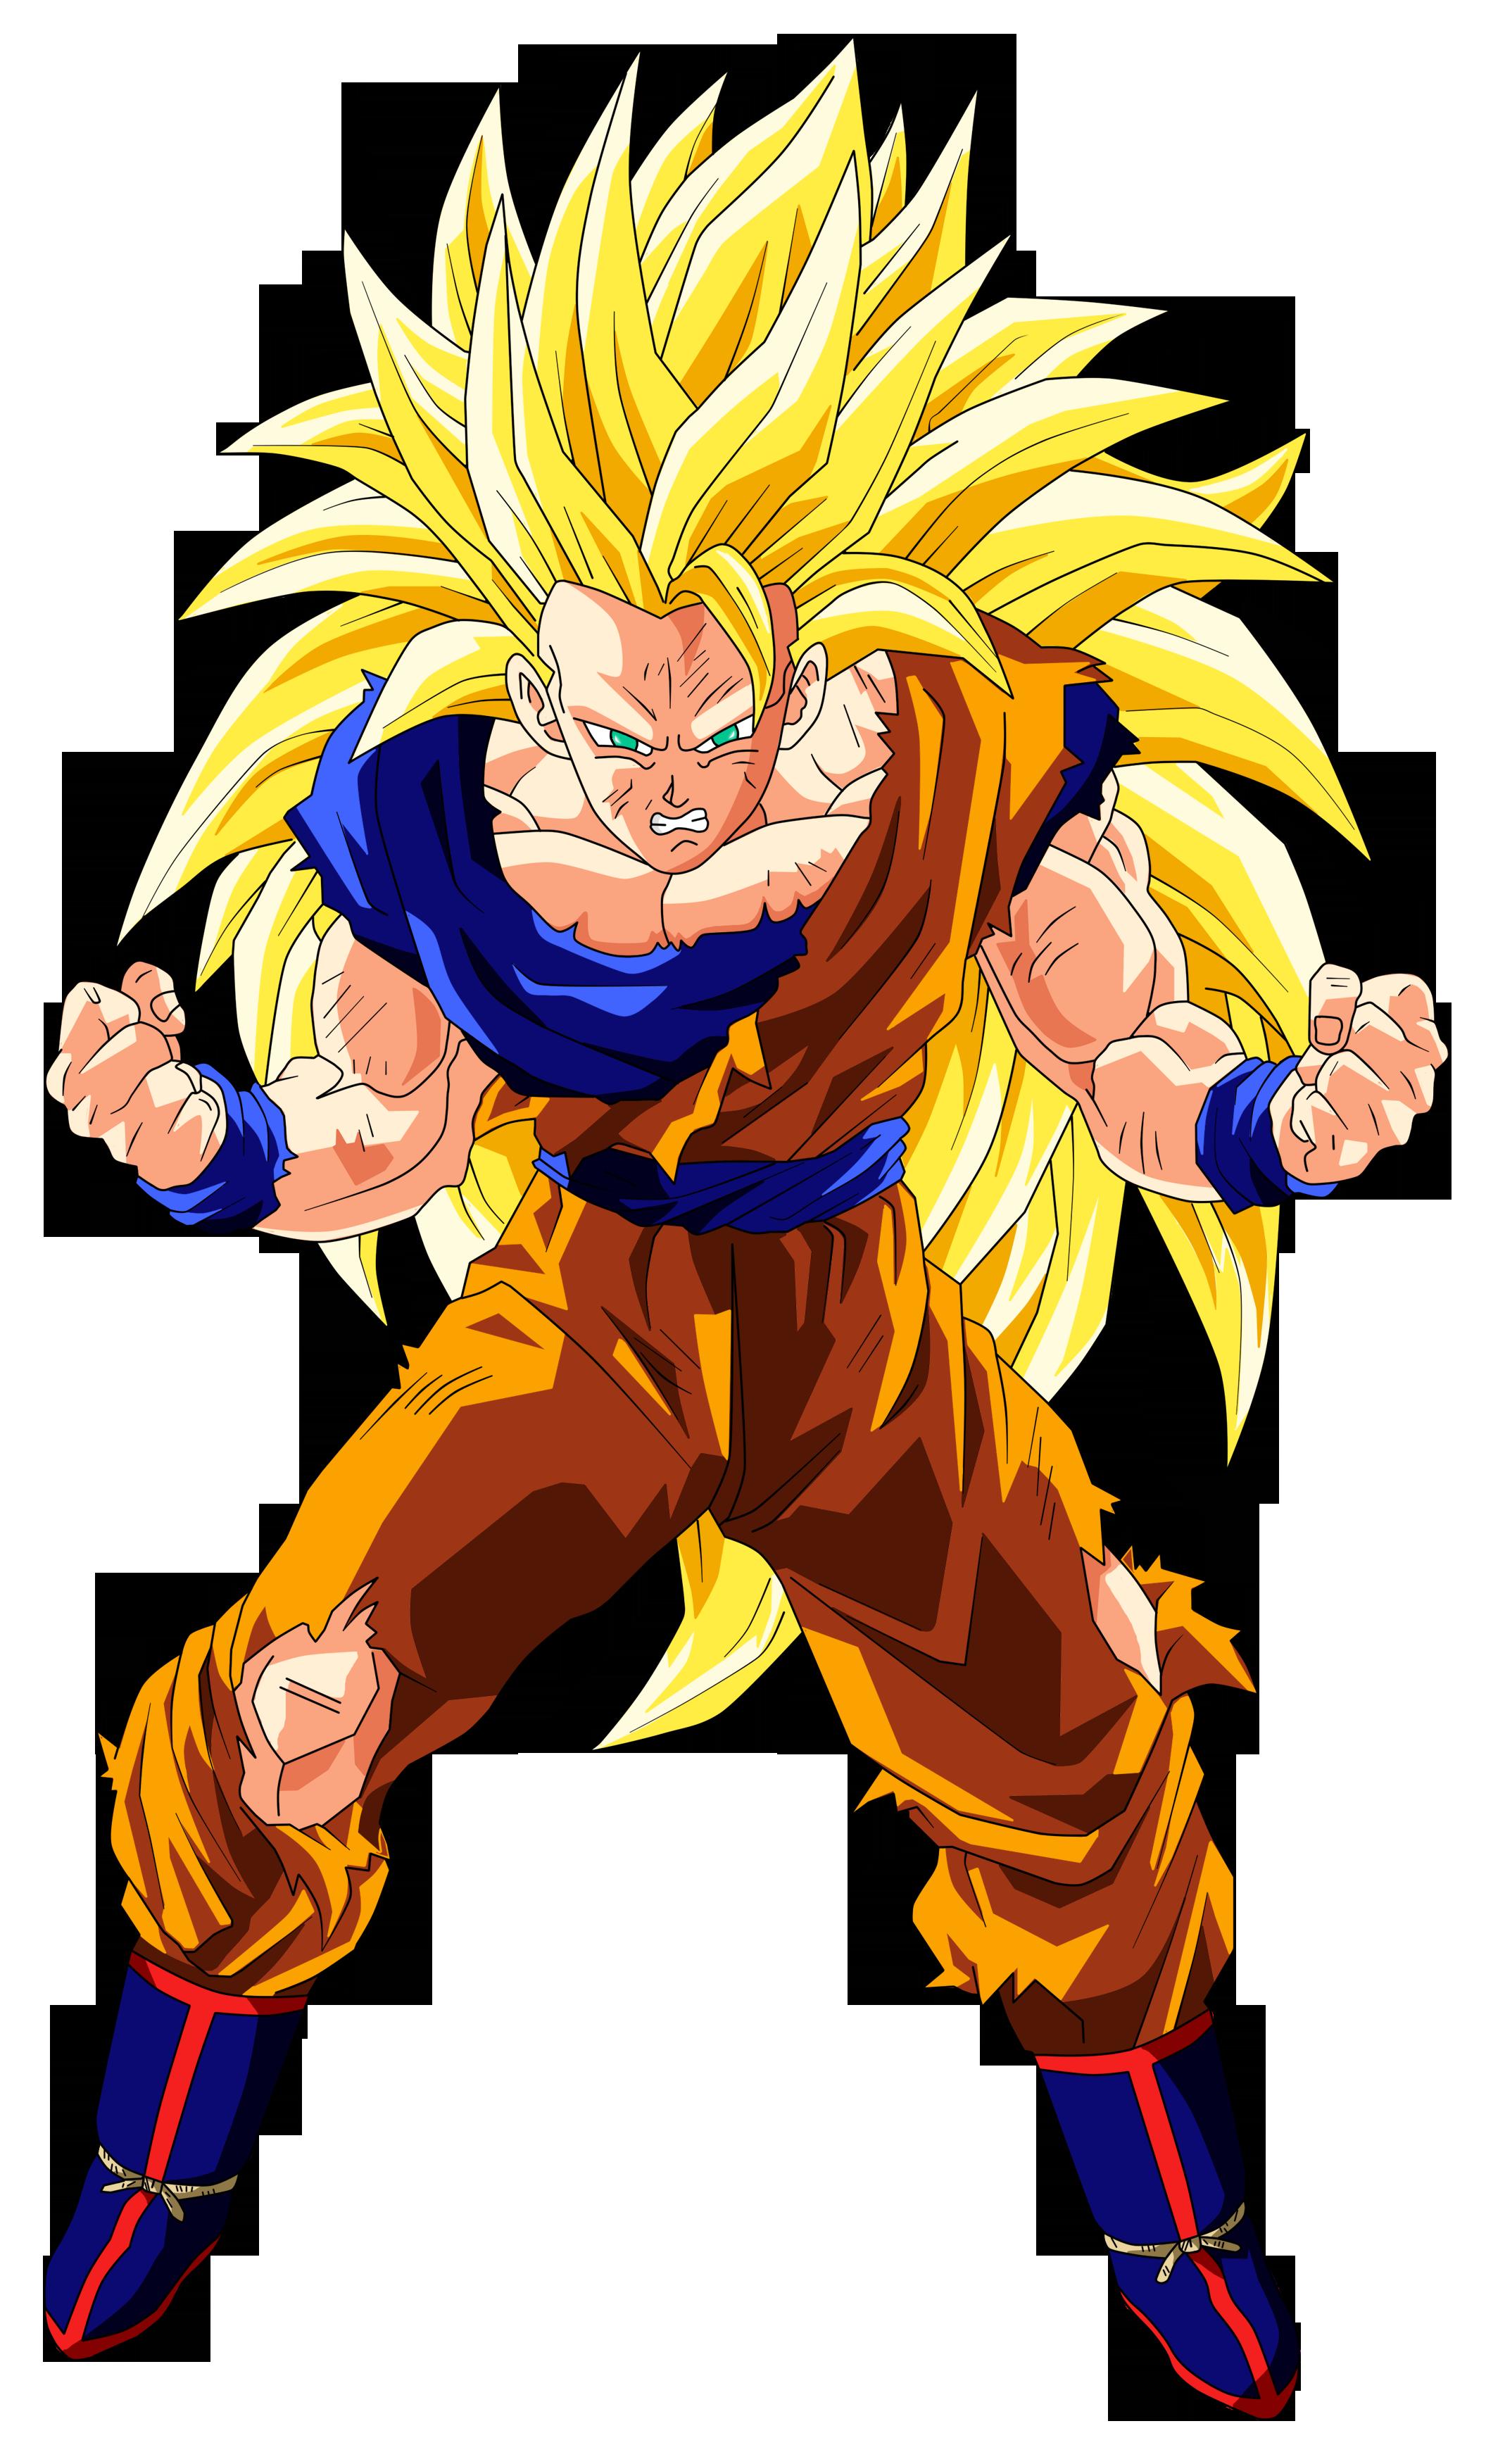 Super Saiyan 3